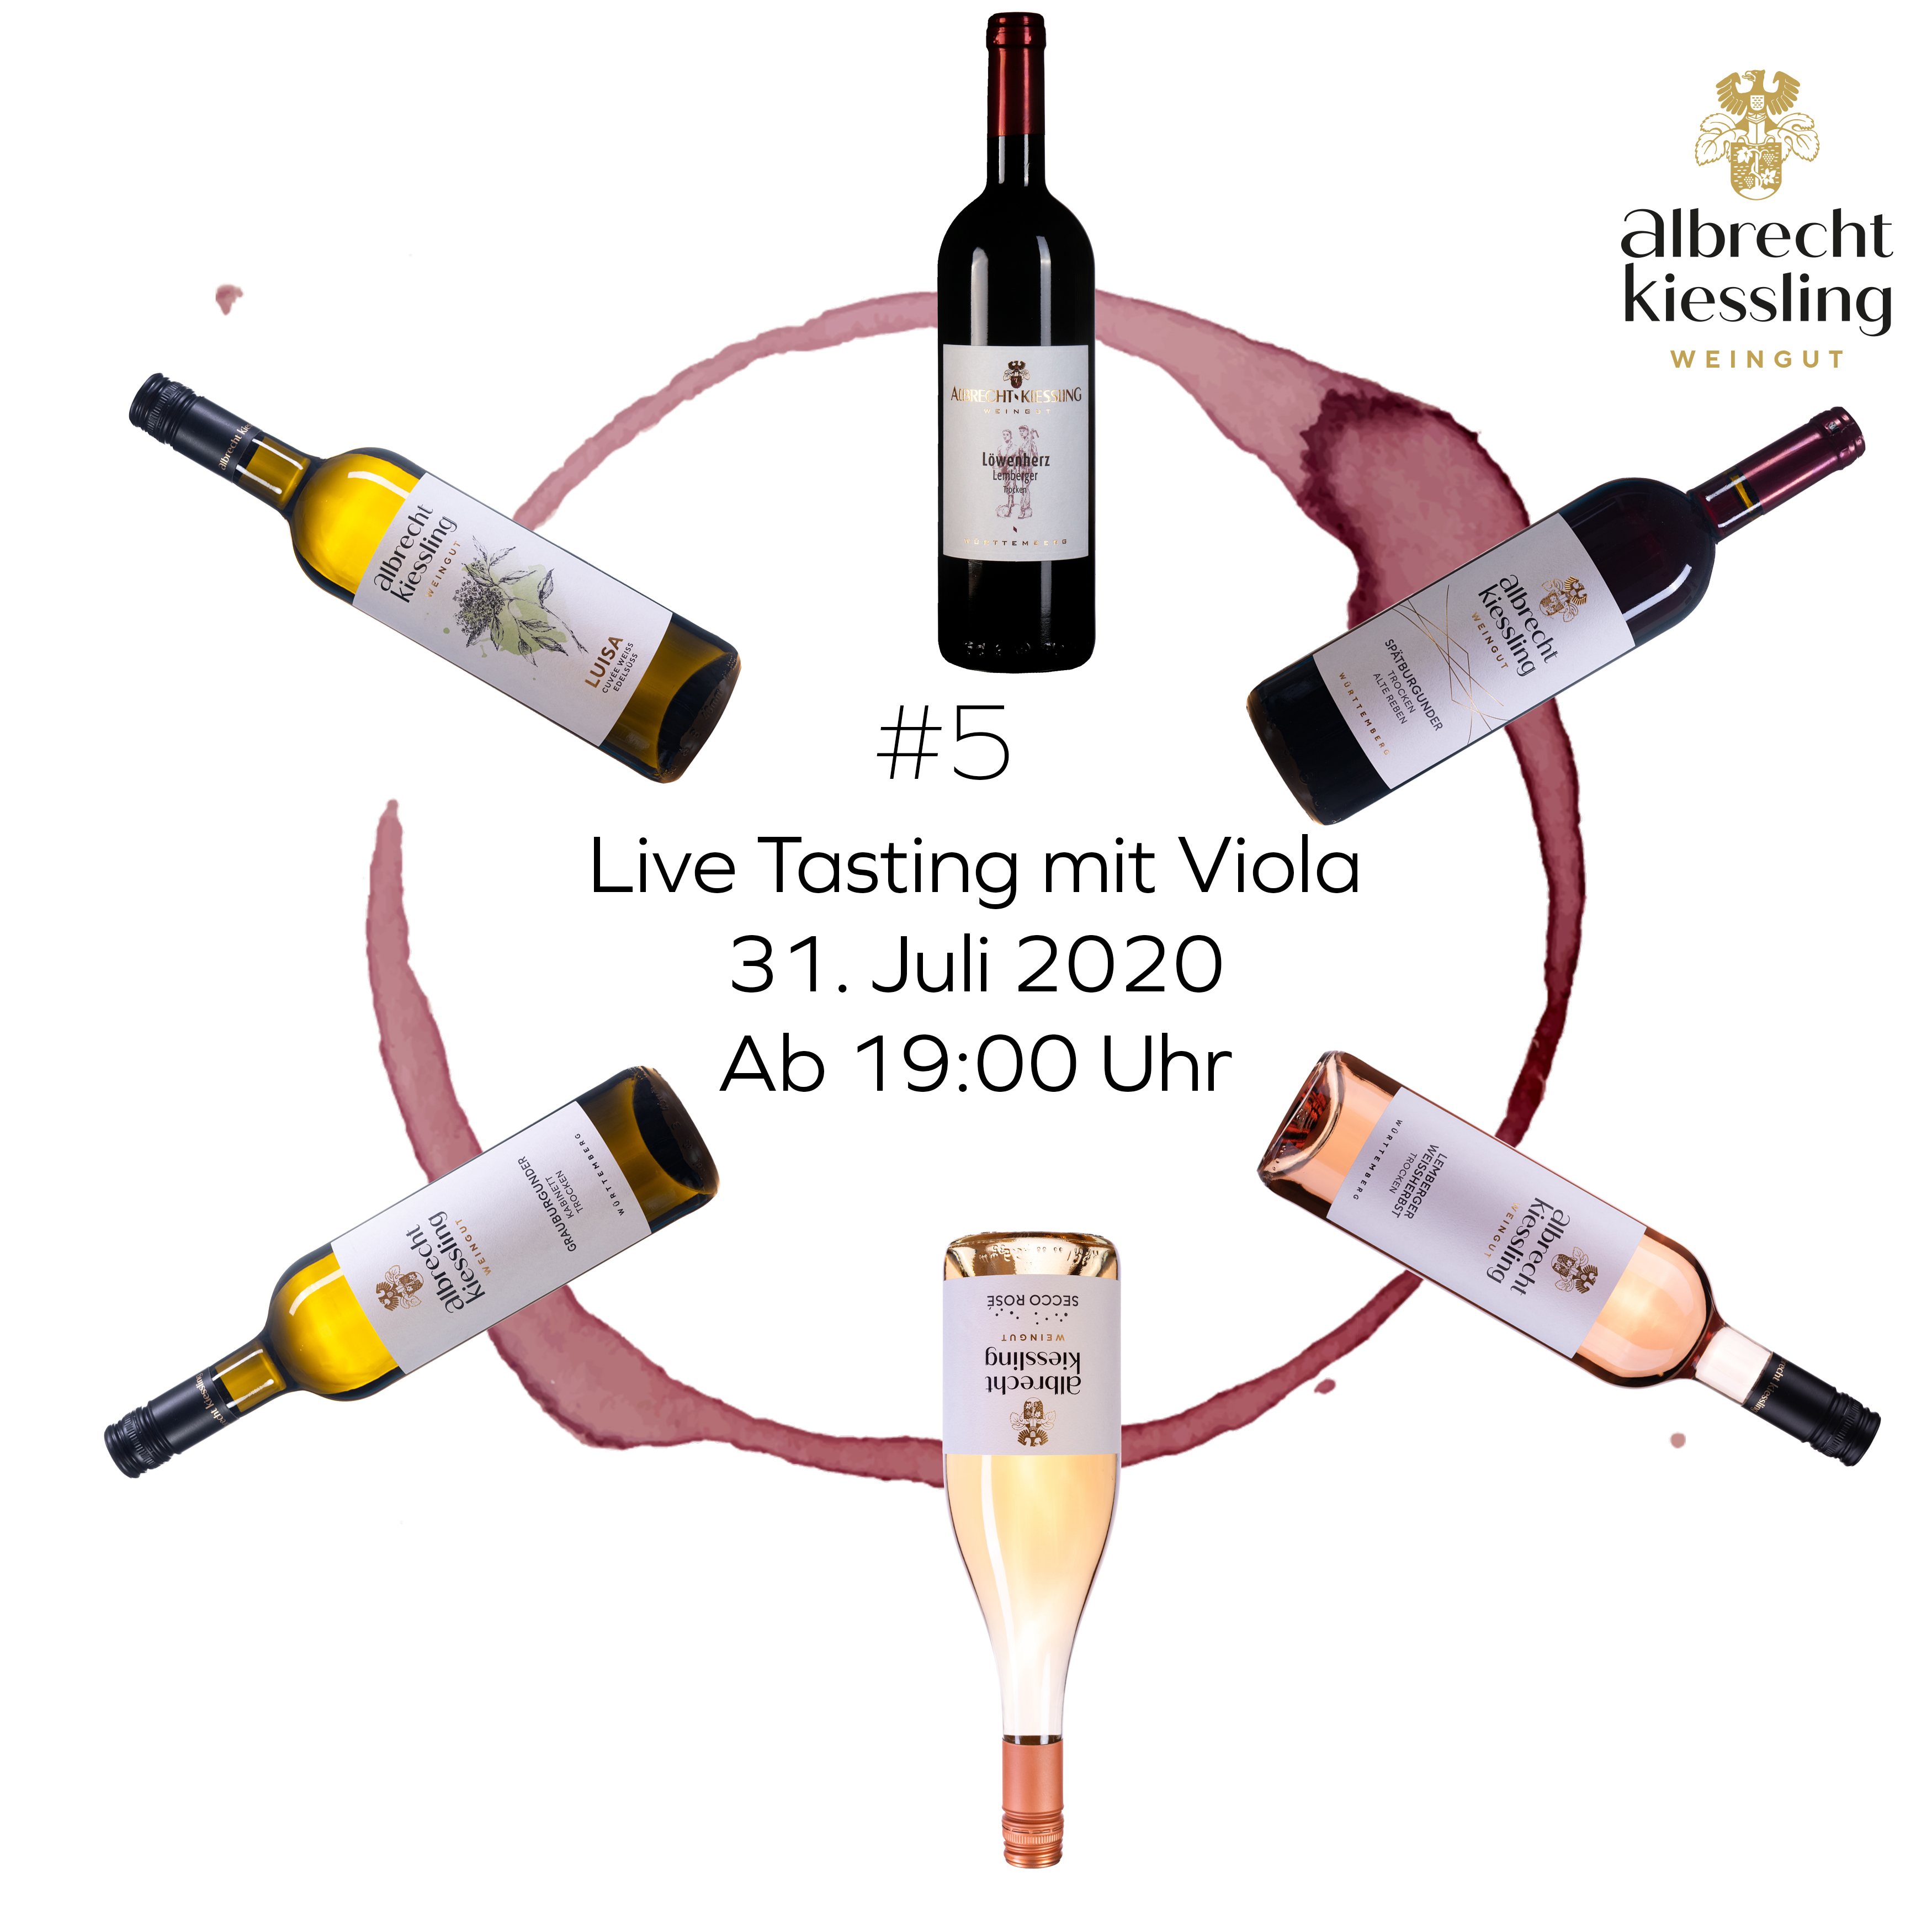 Live-Tasting mit Viola #5